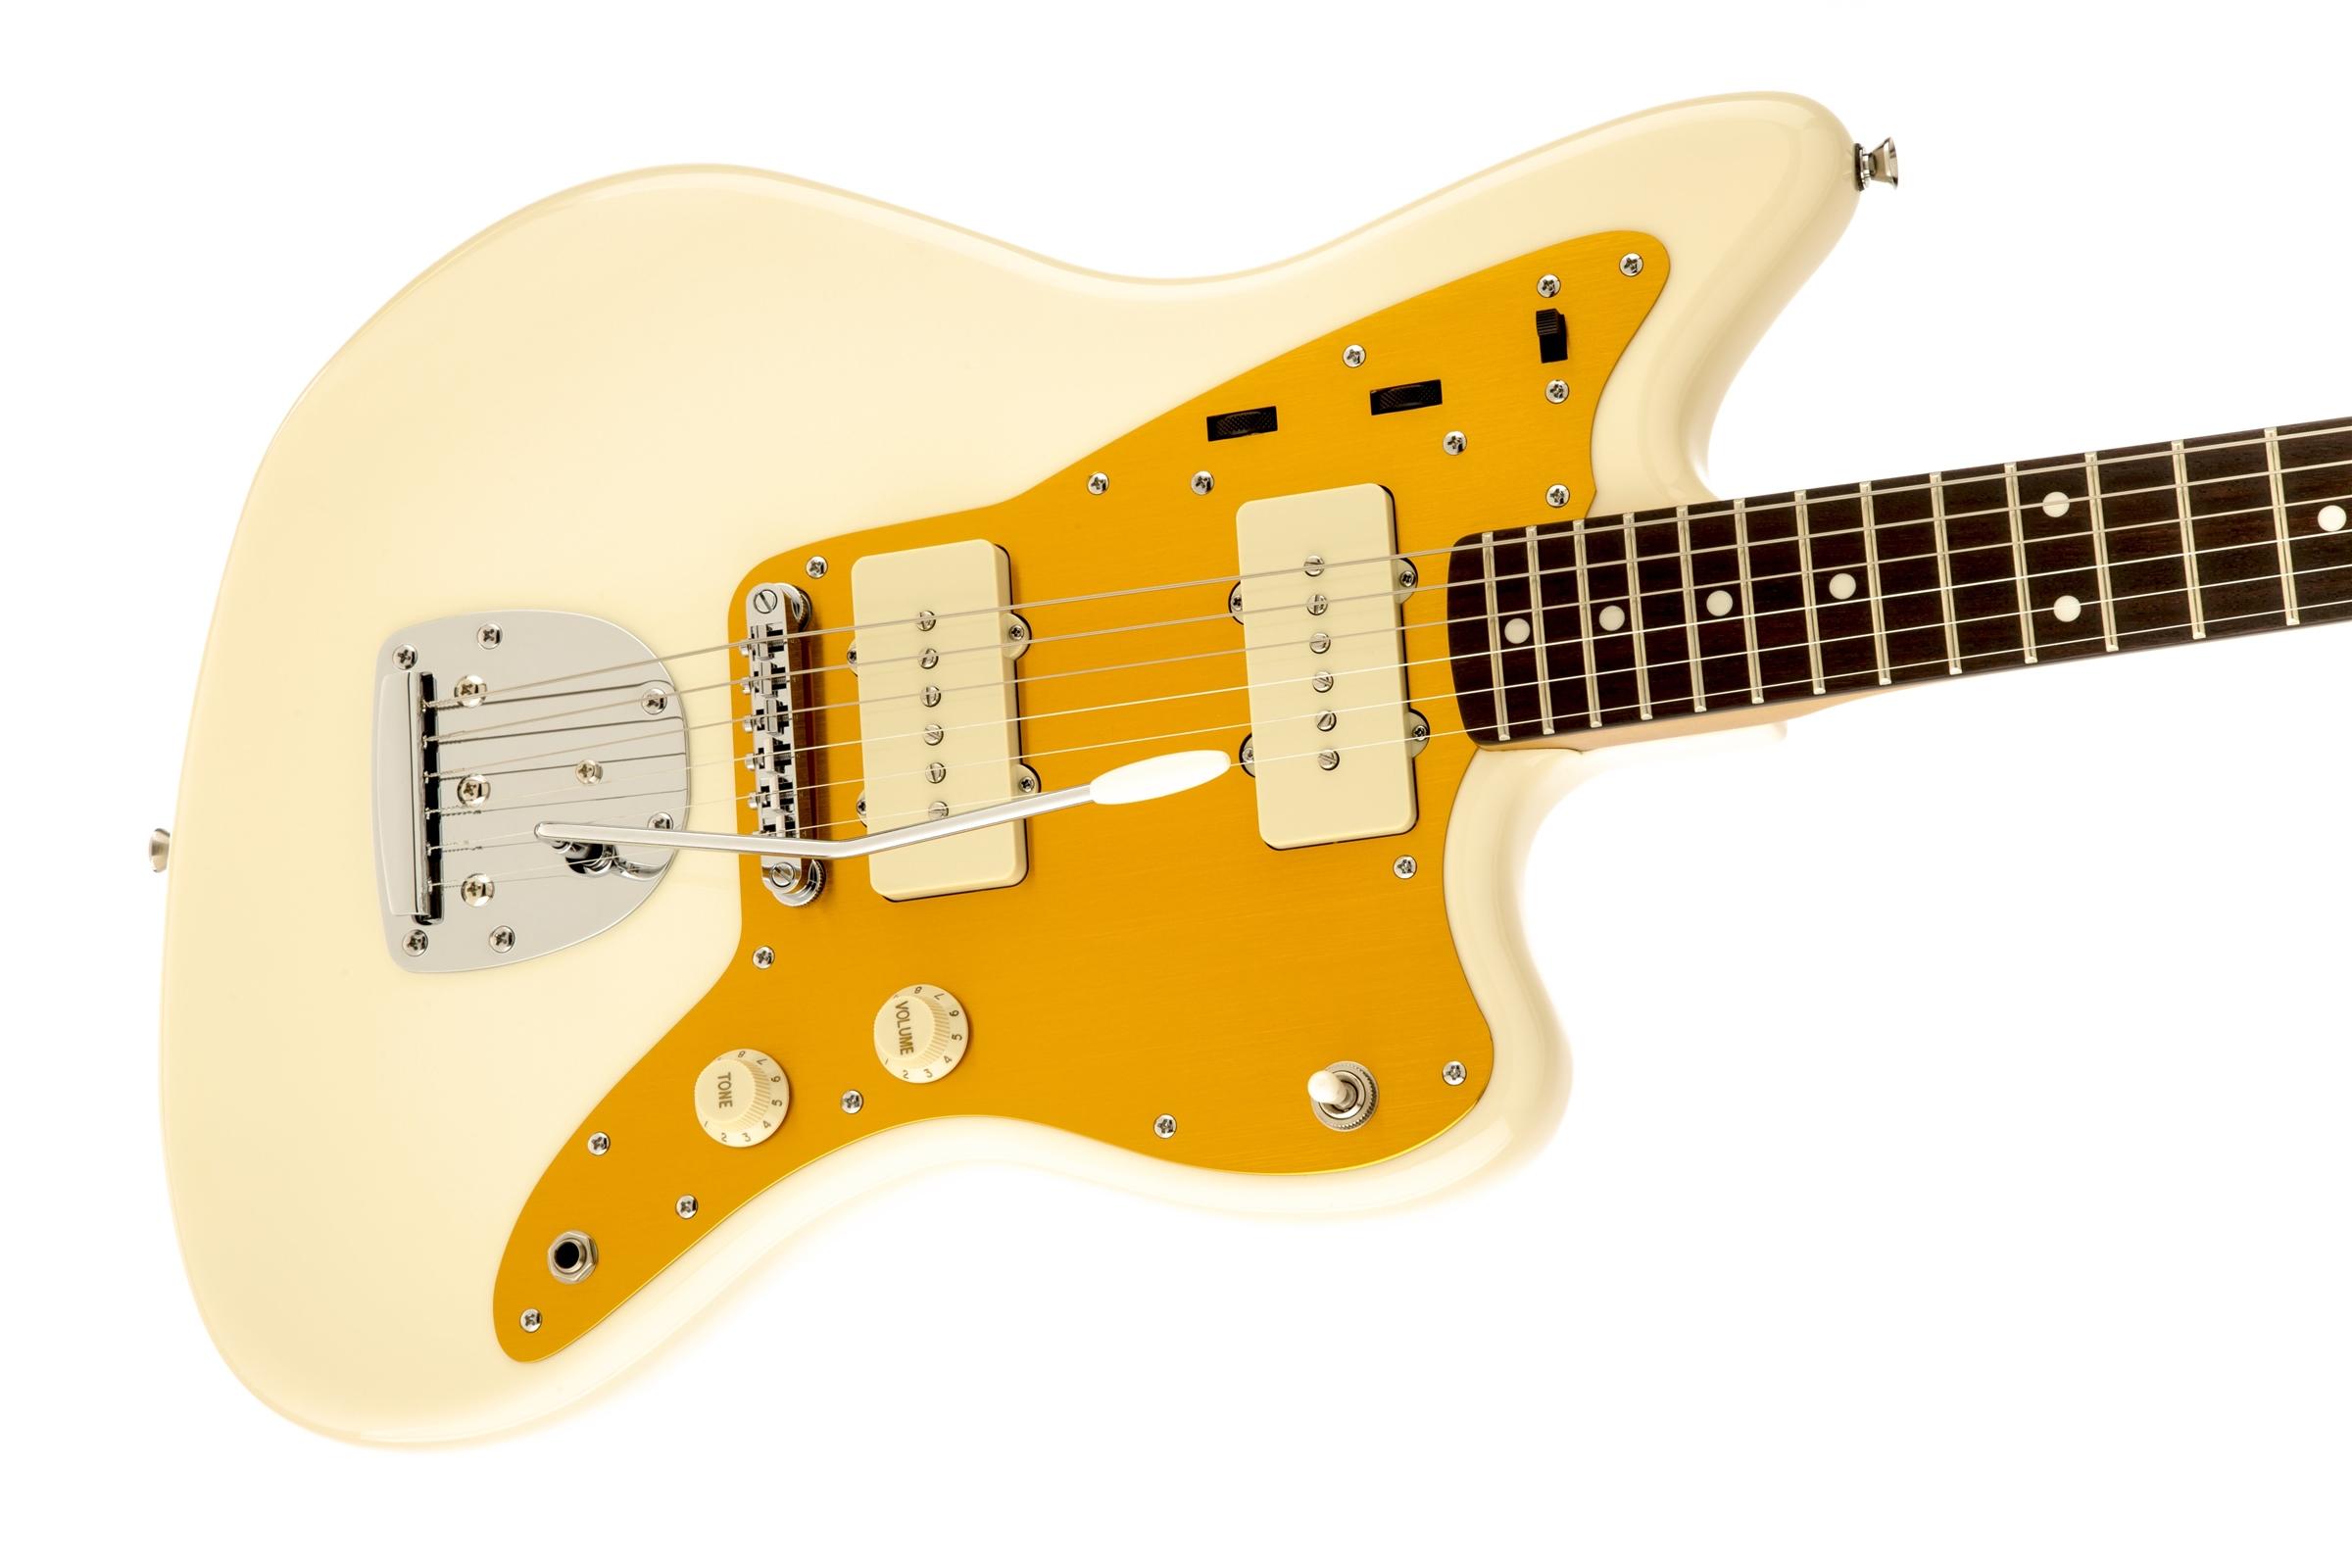 J Mascis Jazzmaster Squier Electric Guitars Fender Guitar Wiring Diagrams